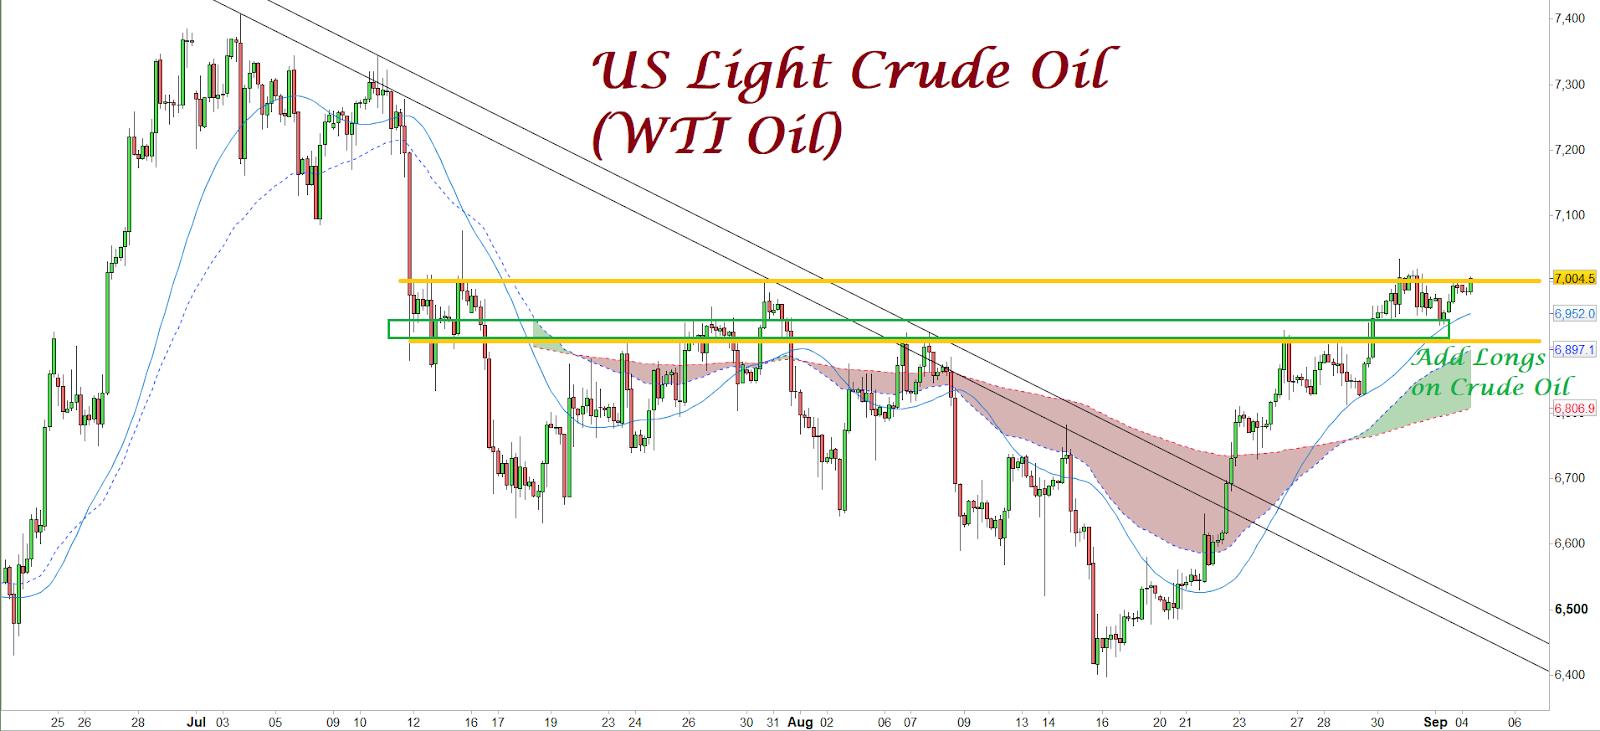 Donovan Norfolk's Market Analysis: US Light Crude Oil (WTI